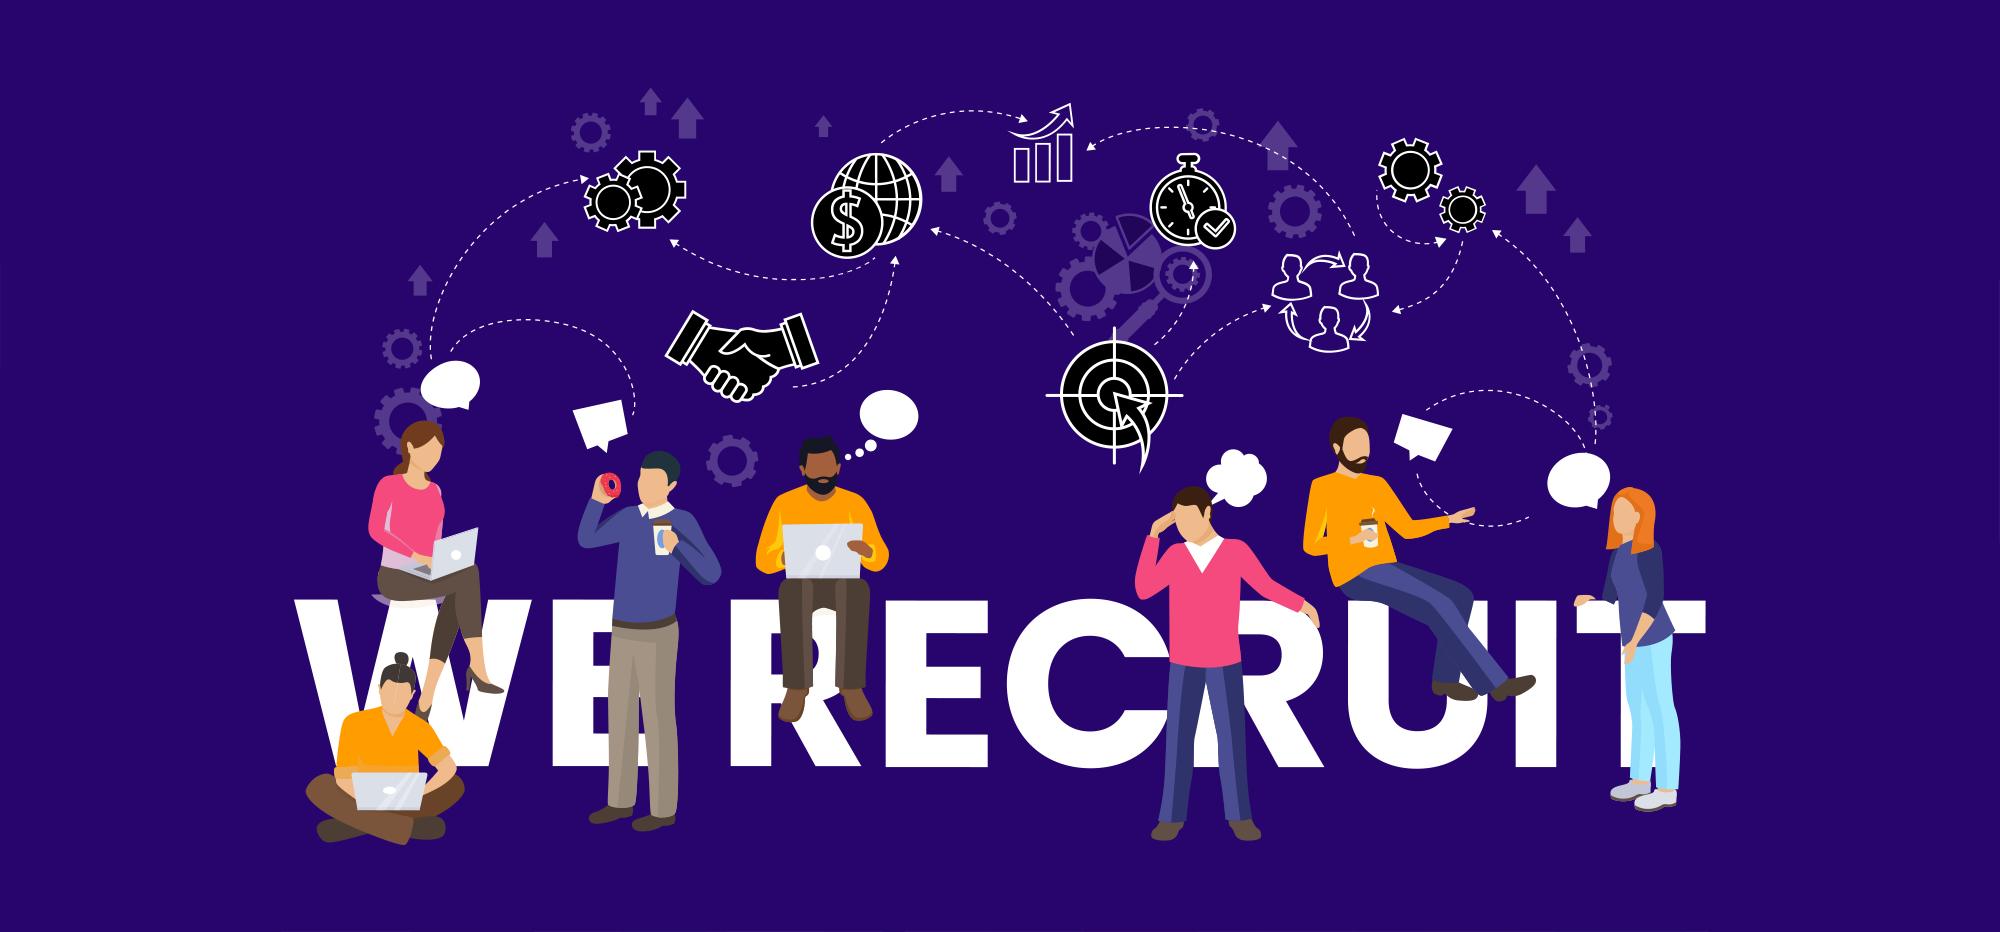 Recrutement chez We Recruit : offres d'emploi